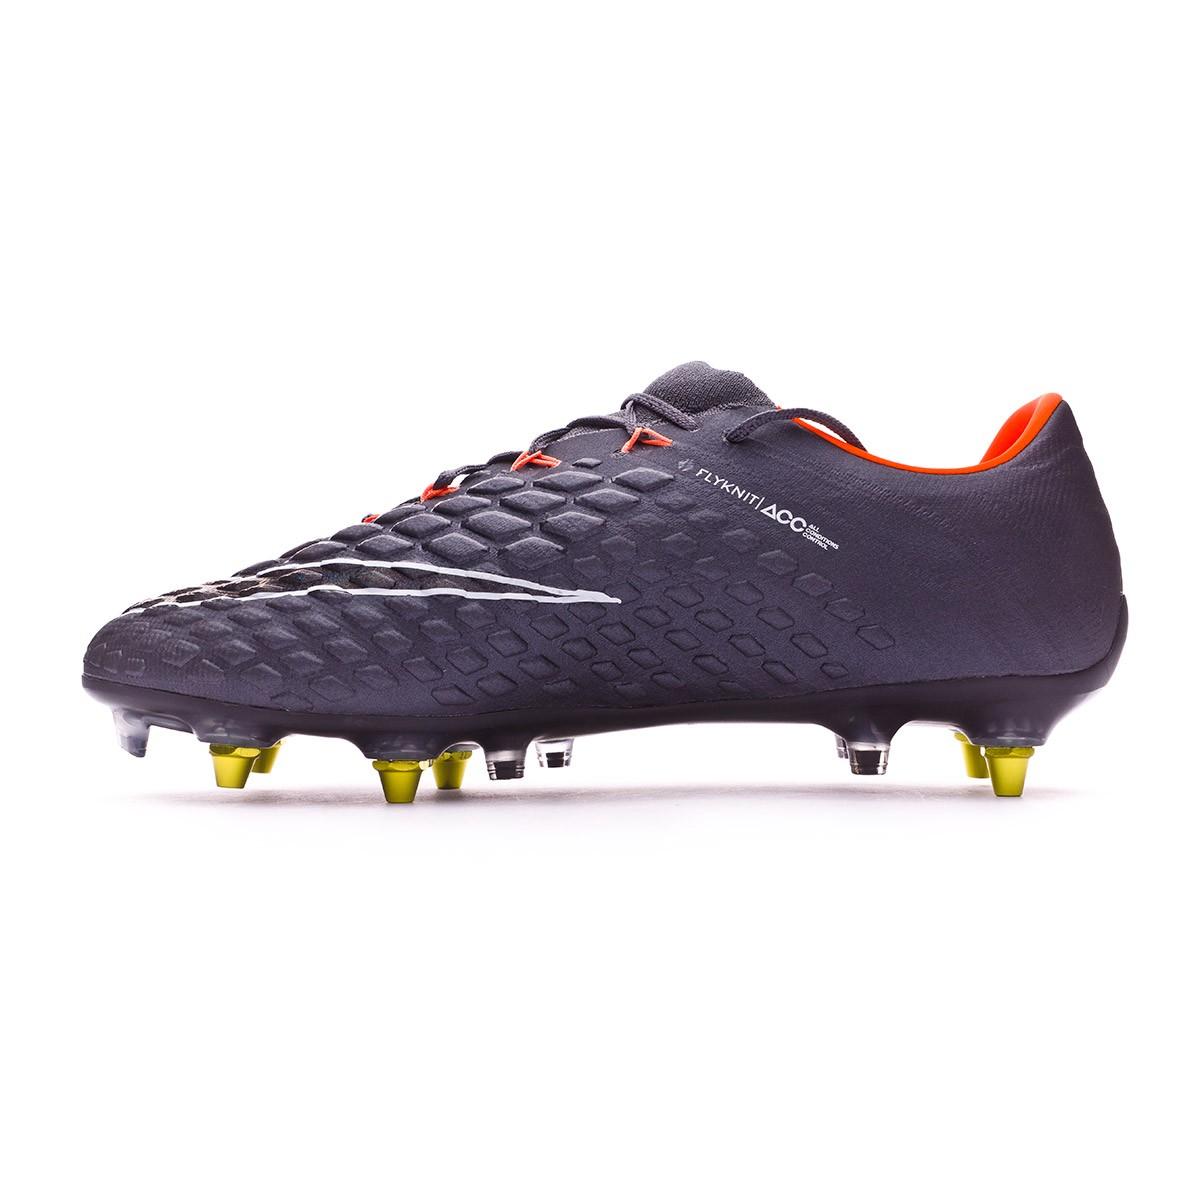 buy popular 1bdbb a69a7 Football Boots Nike Hypervenom Phantom III Elite SG-Pro Anti-Clog Dark  grey-Total orange-White - Football store Fútbol Emotion